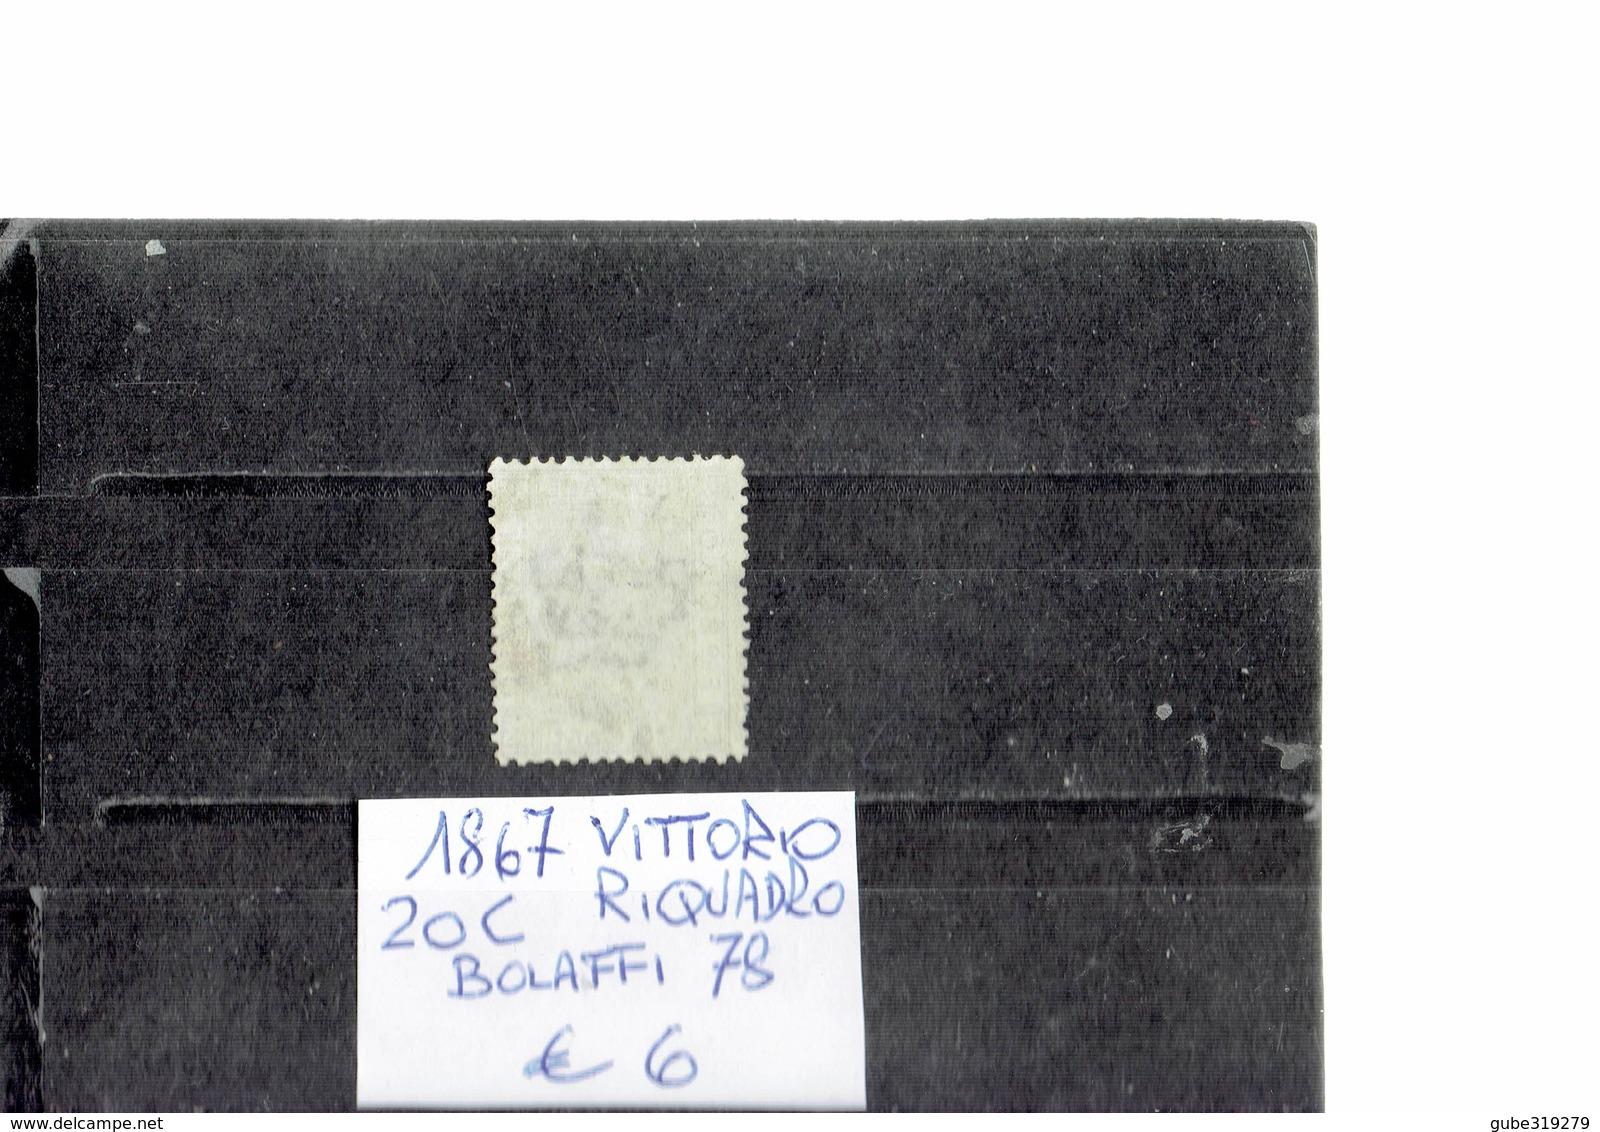 ITALY 1867 - VITTORIO RIQUADRO AZZURRO  20 CENTESIMI   USATO (Bolaffi 78) ALBVEC ITA 20AZR - Usati